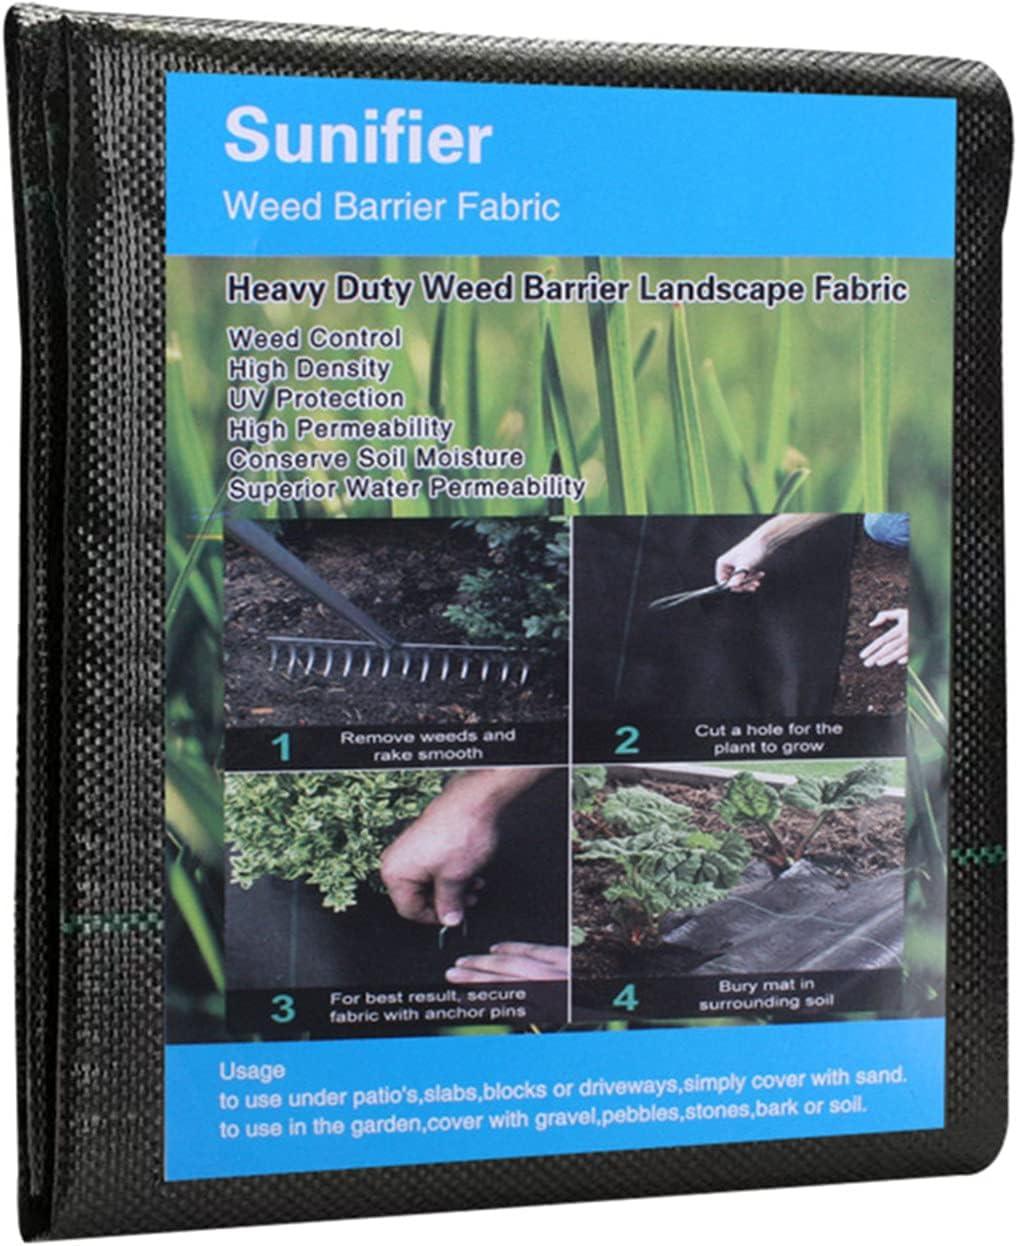 Weed Barrier Landscape Fabric Heavy Duty,Garden Fabric Weed Barrier,Black Mulch for Landscaping, Weed Blocker Fabric Garden Bed Cover Garden Supplies (5ft x 60ft)